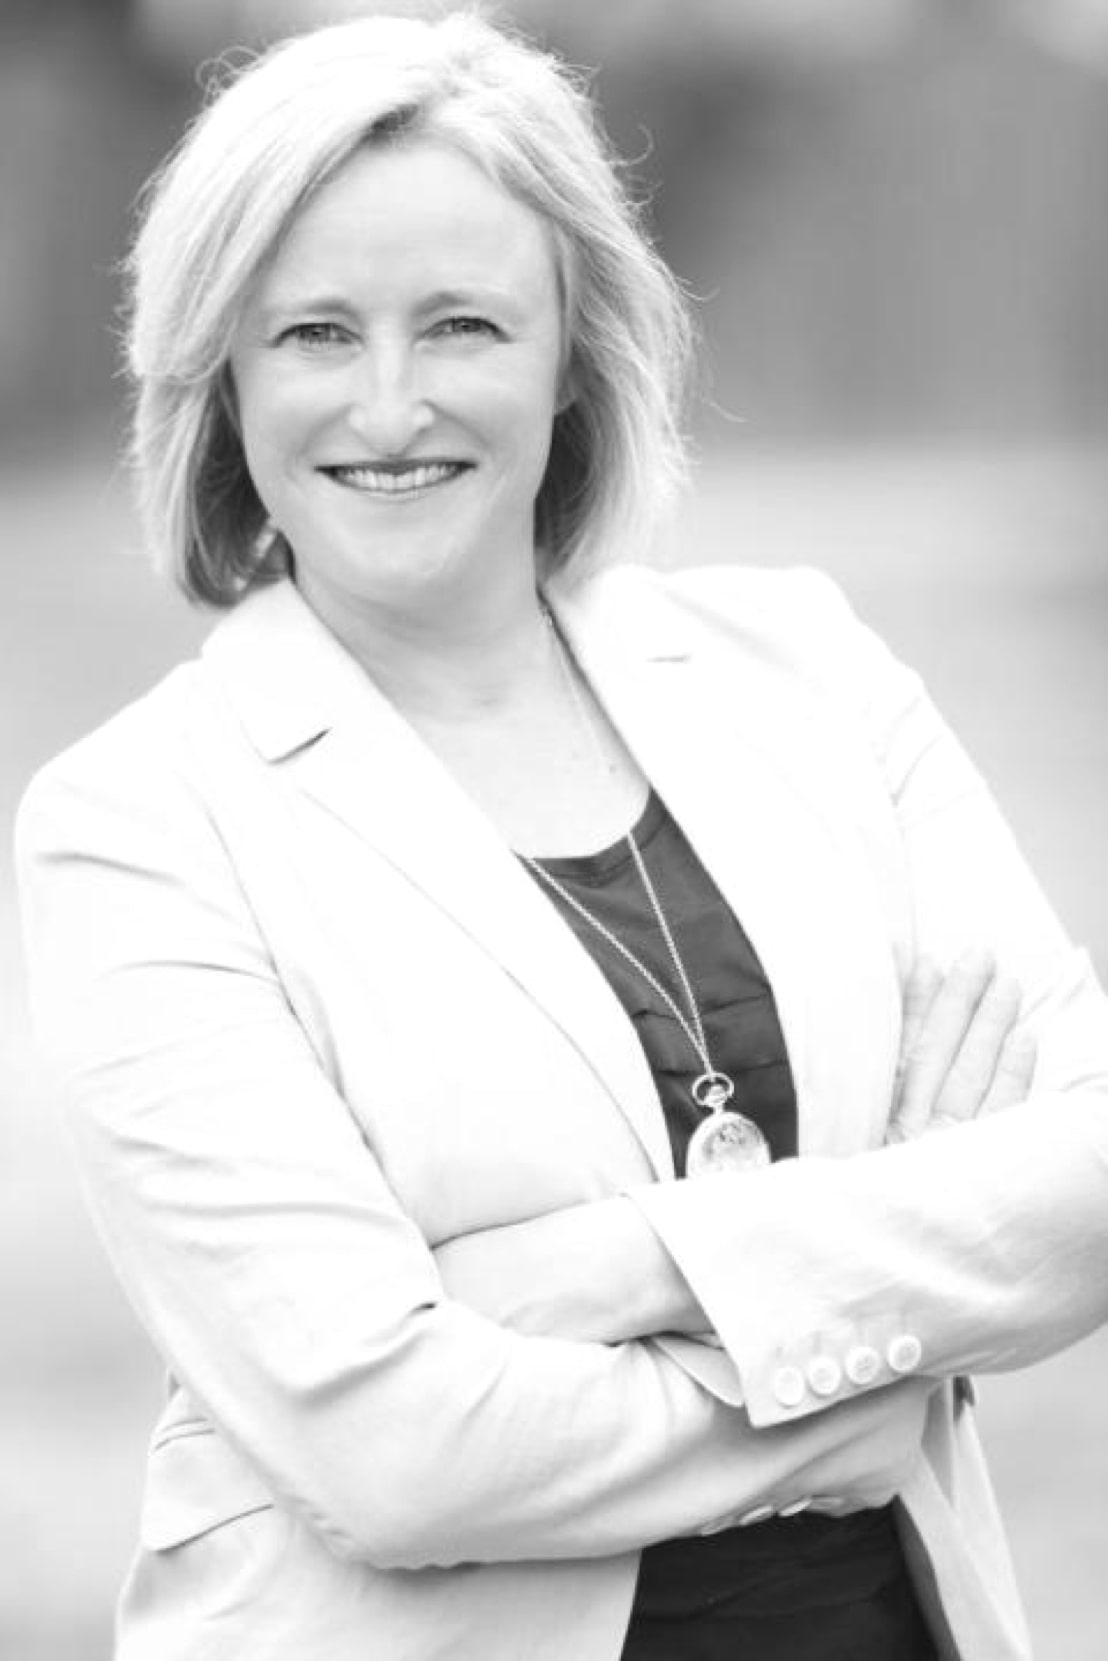 Chantal Jonkergouw Few For Executive Women